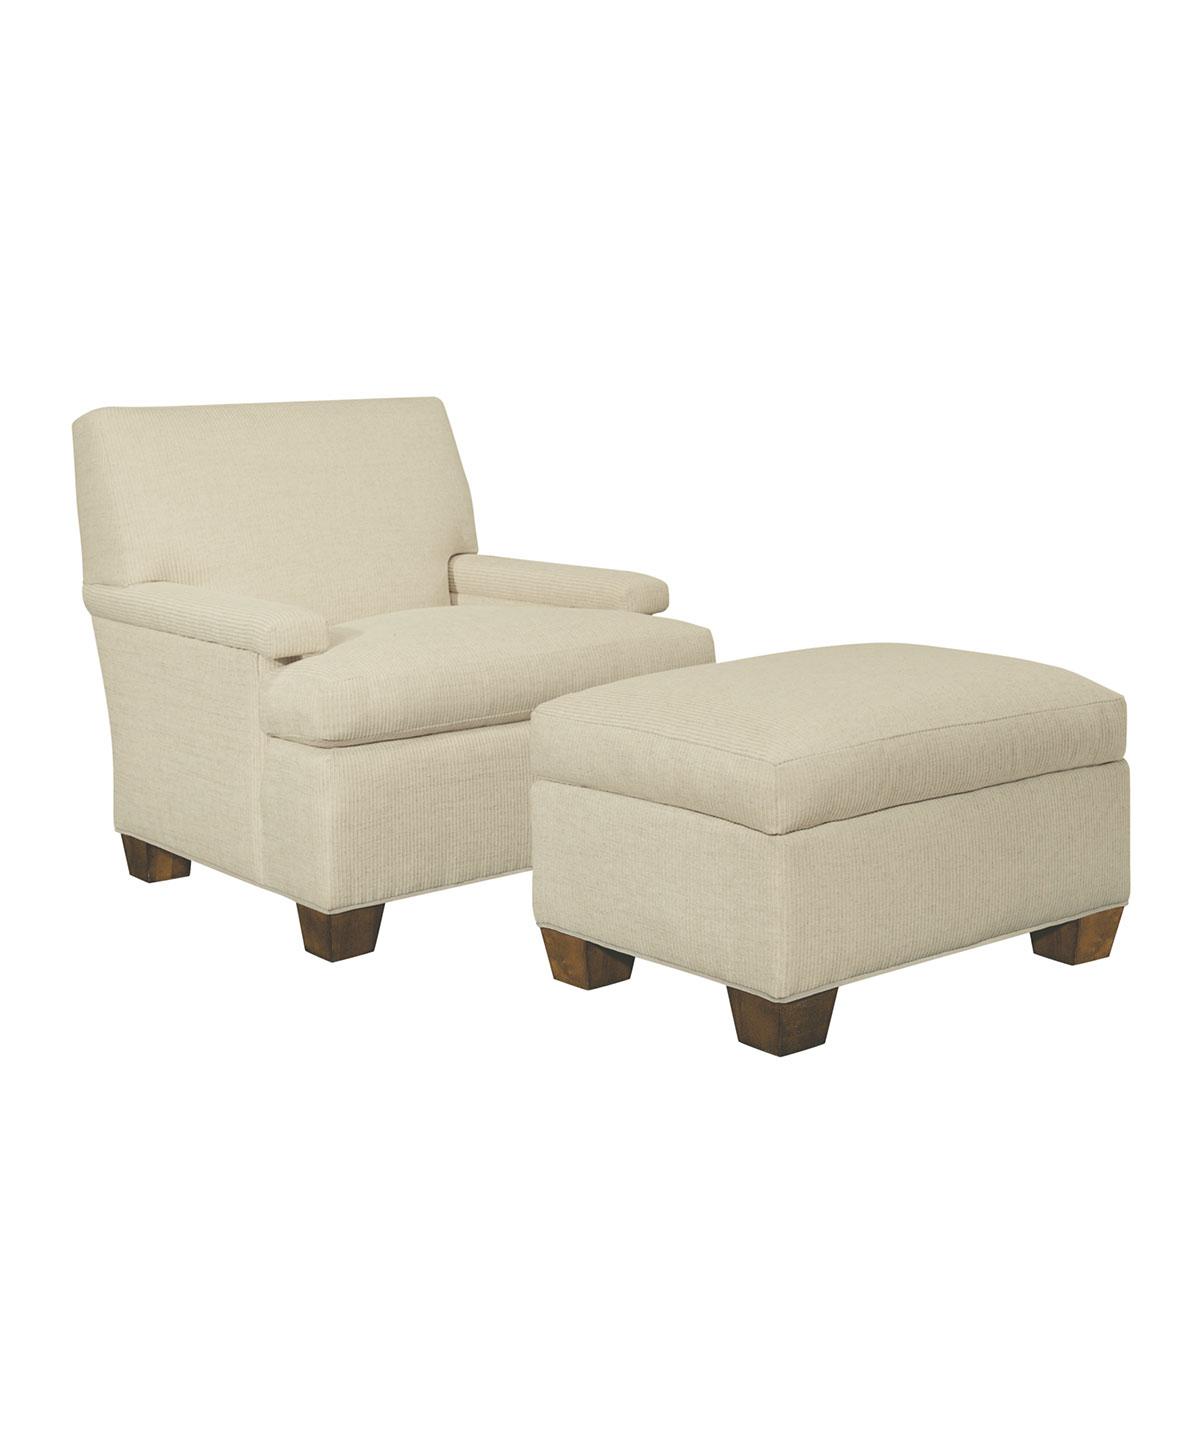 MacDonald Chair